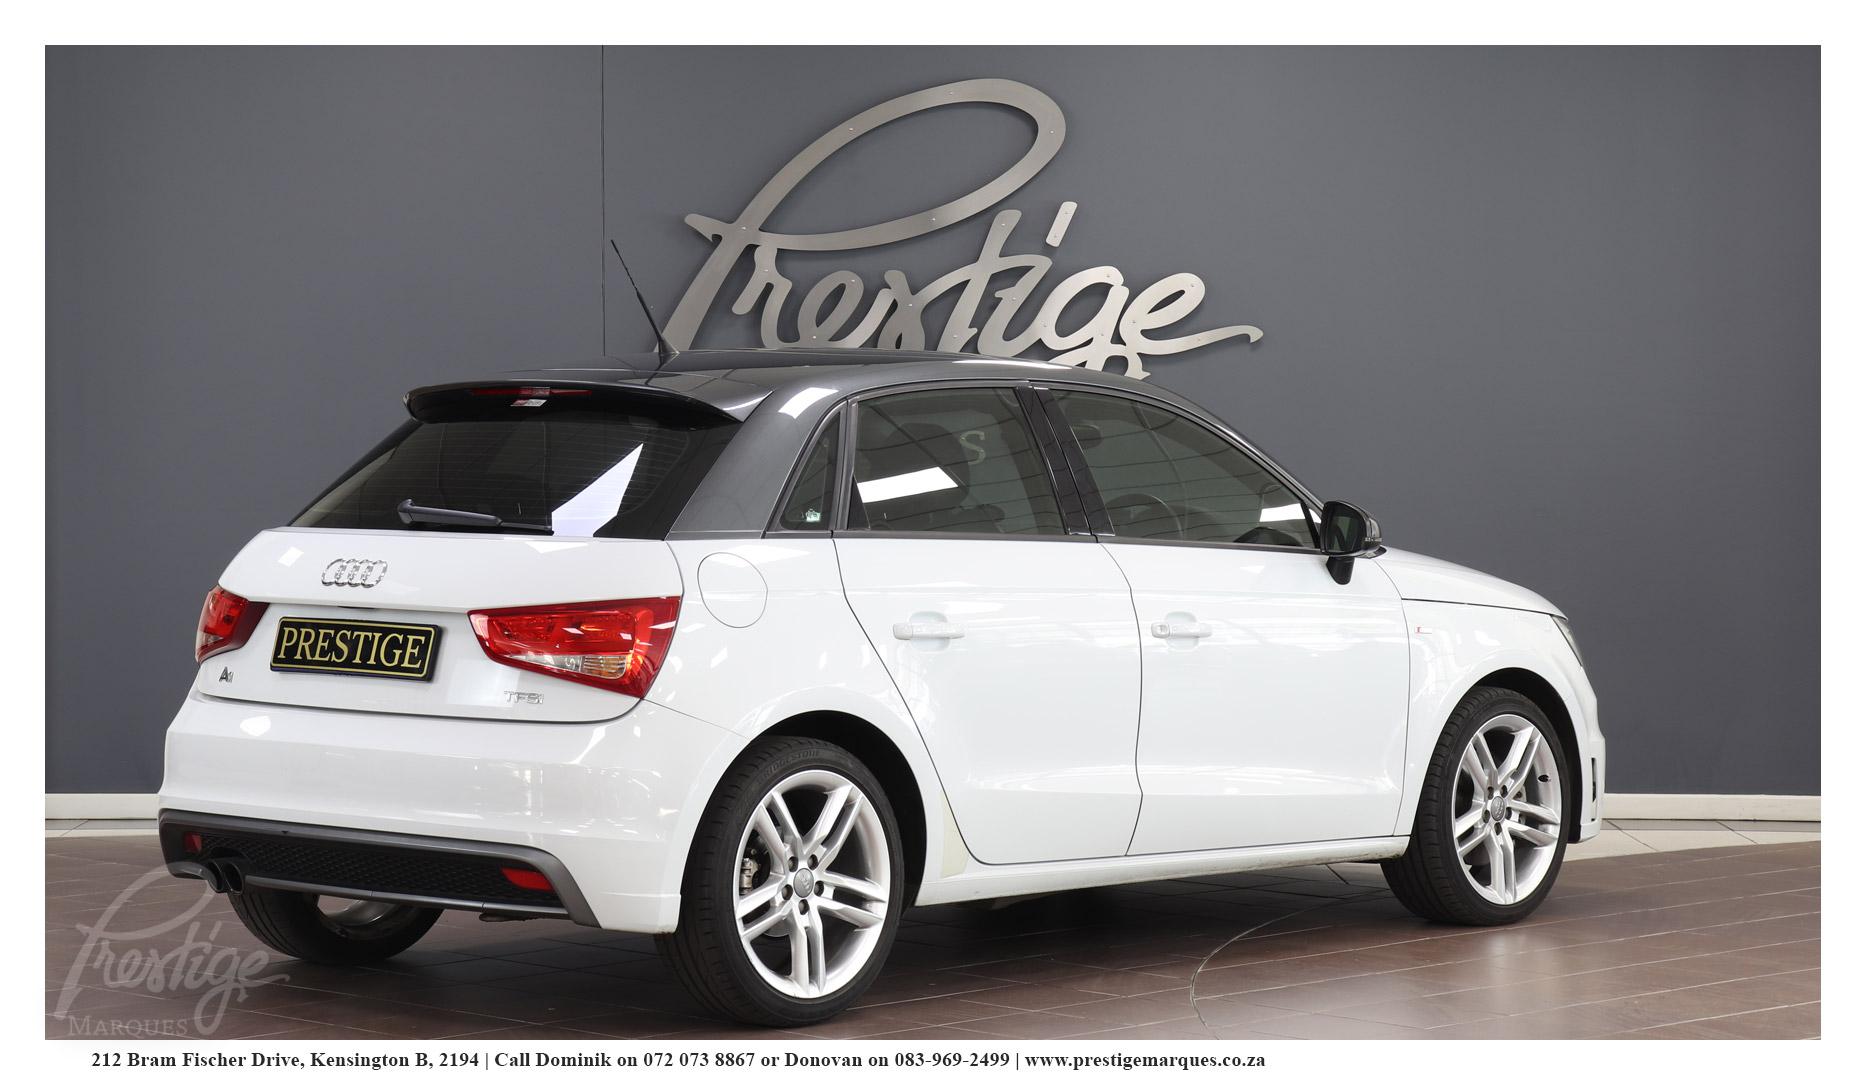 2012-Audi-A1-TFsi-STronic-Sline-Sportbackl-Prestige-Marques-Randburg-Sandton-4